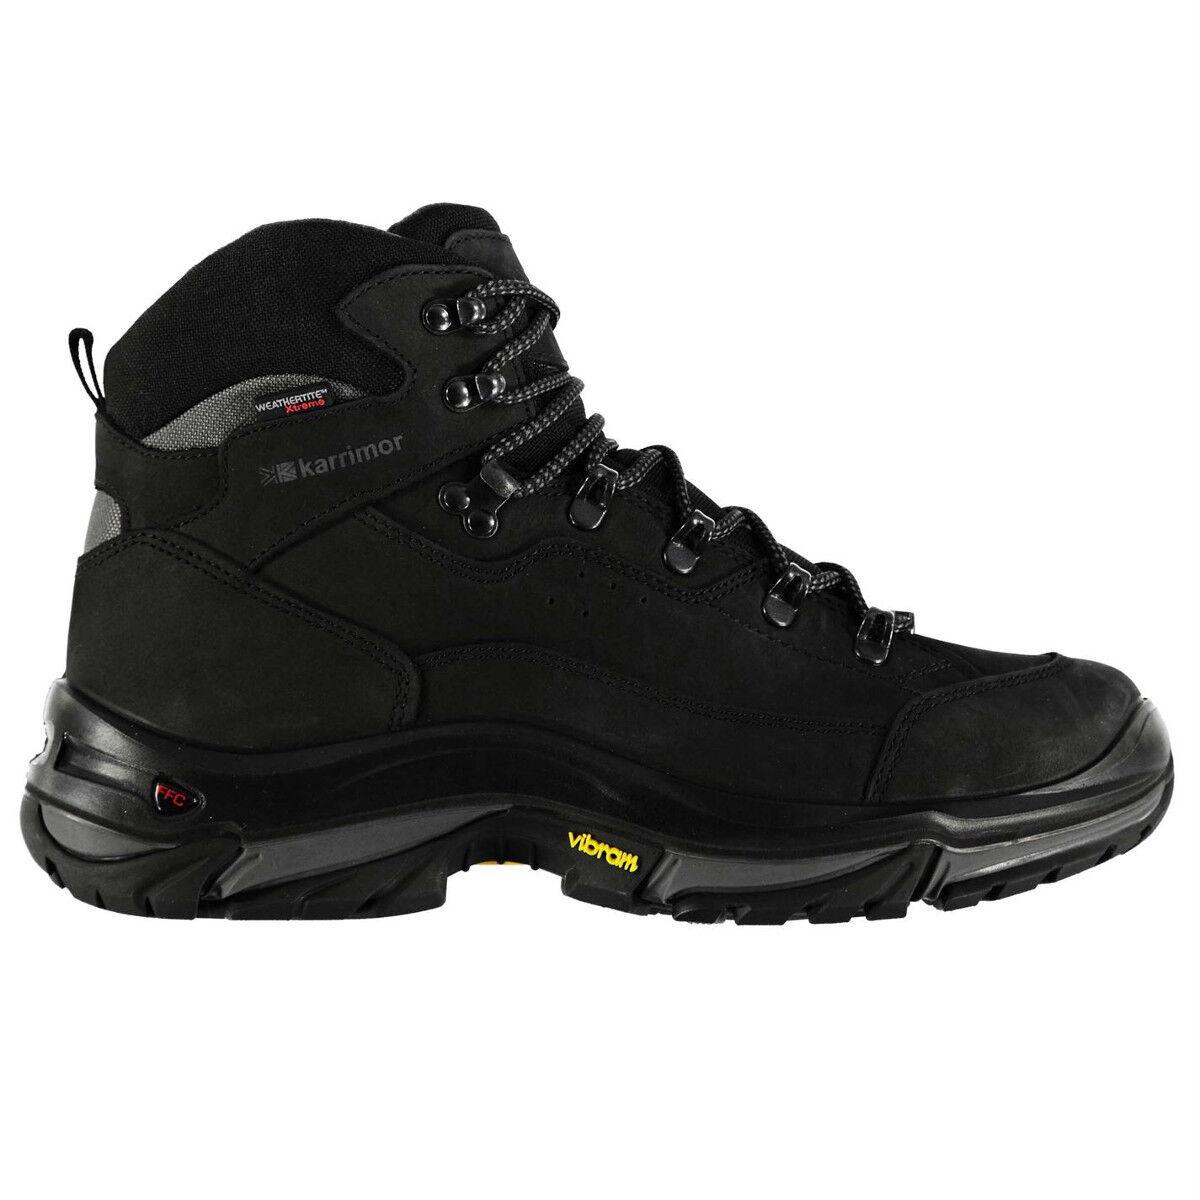 KARRIMOR Men's KSB Brecon Waterproof Mid Hiking Boots NIB Size 10 Vibram